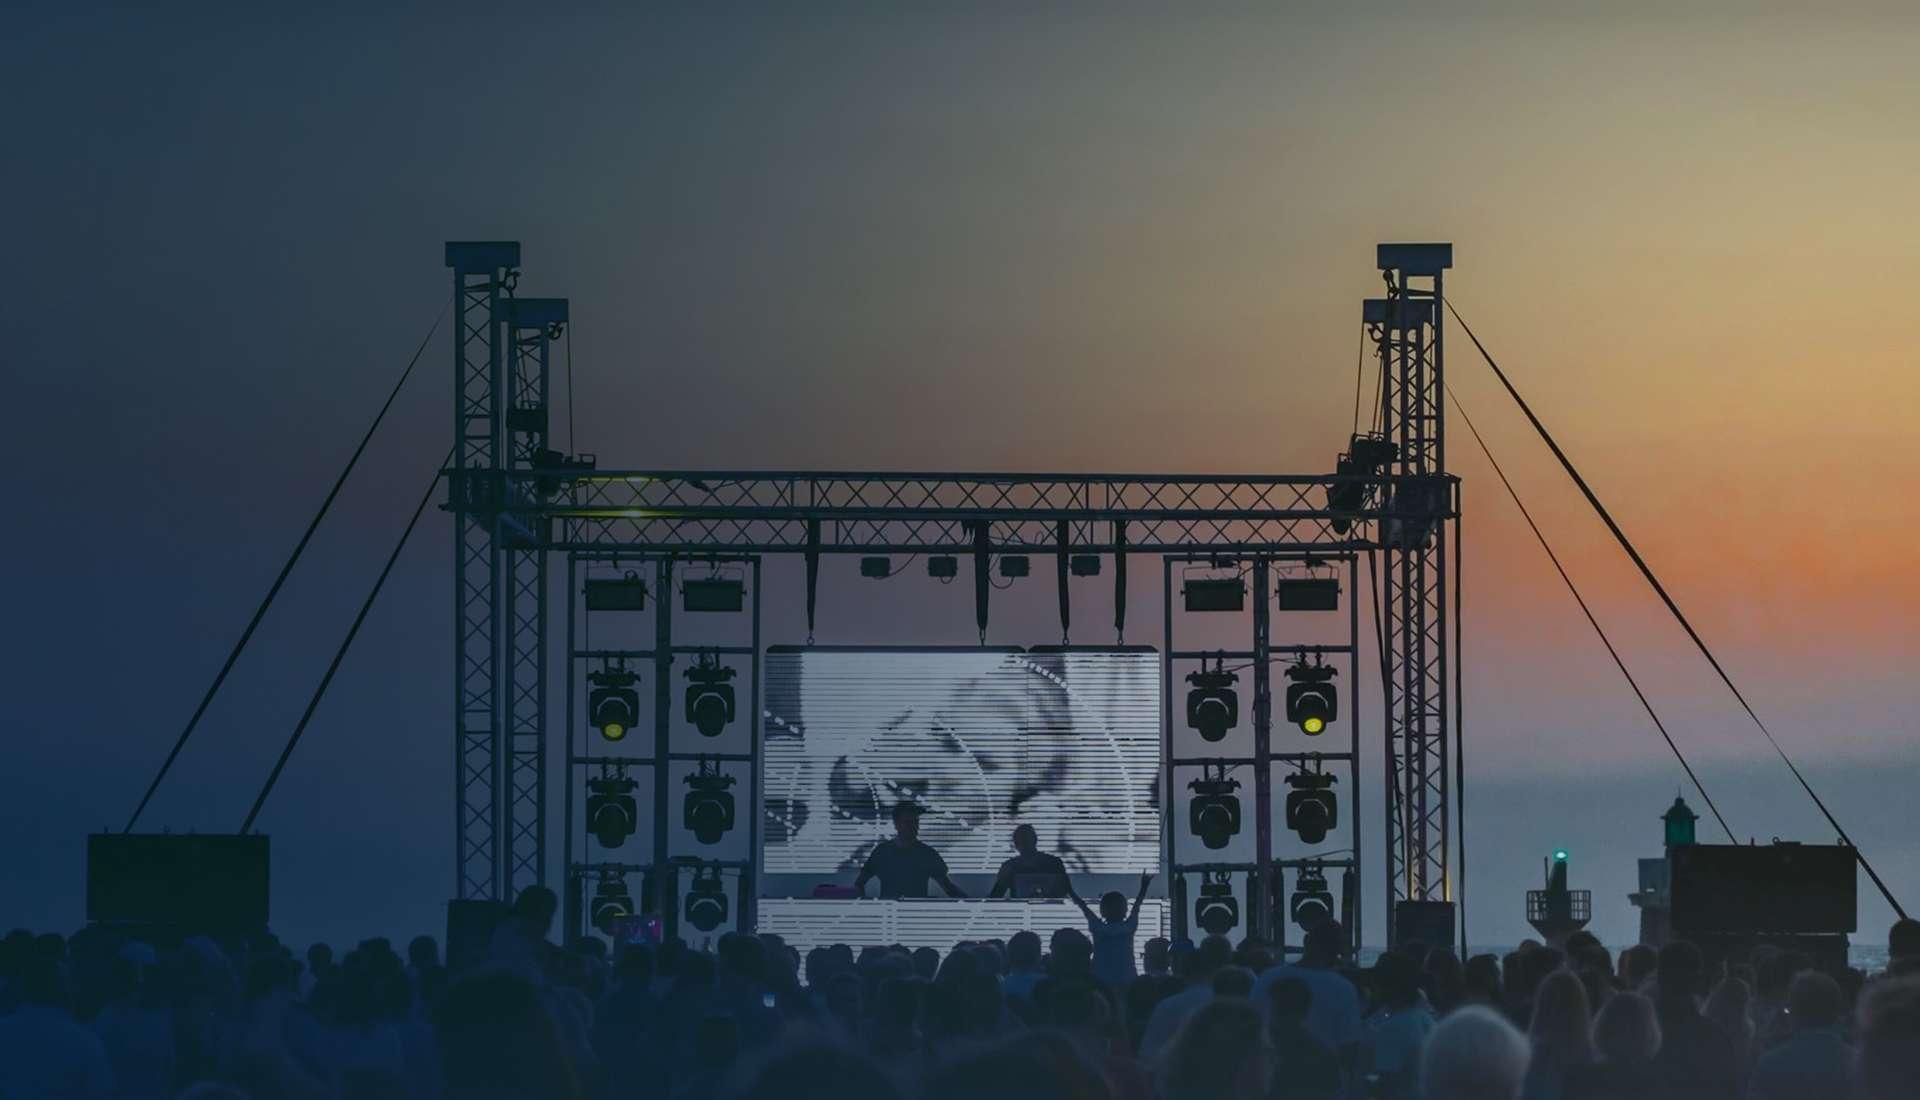 littlefestival_2019